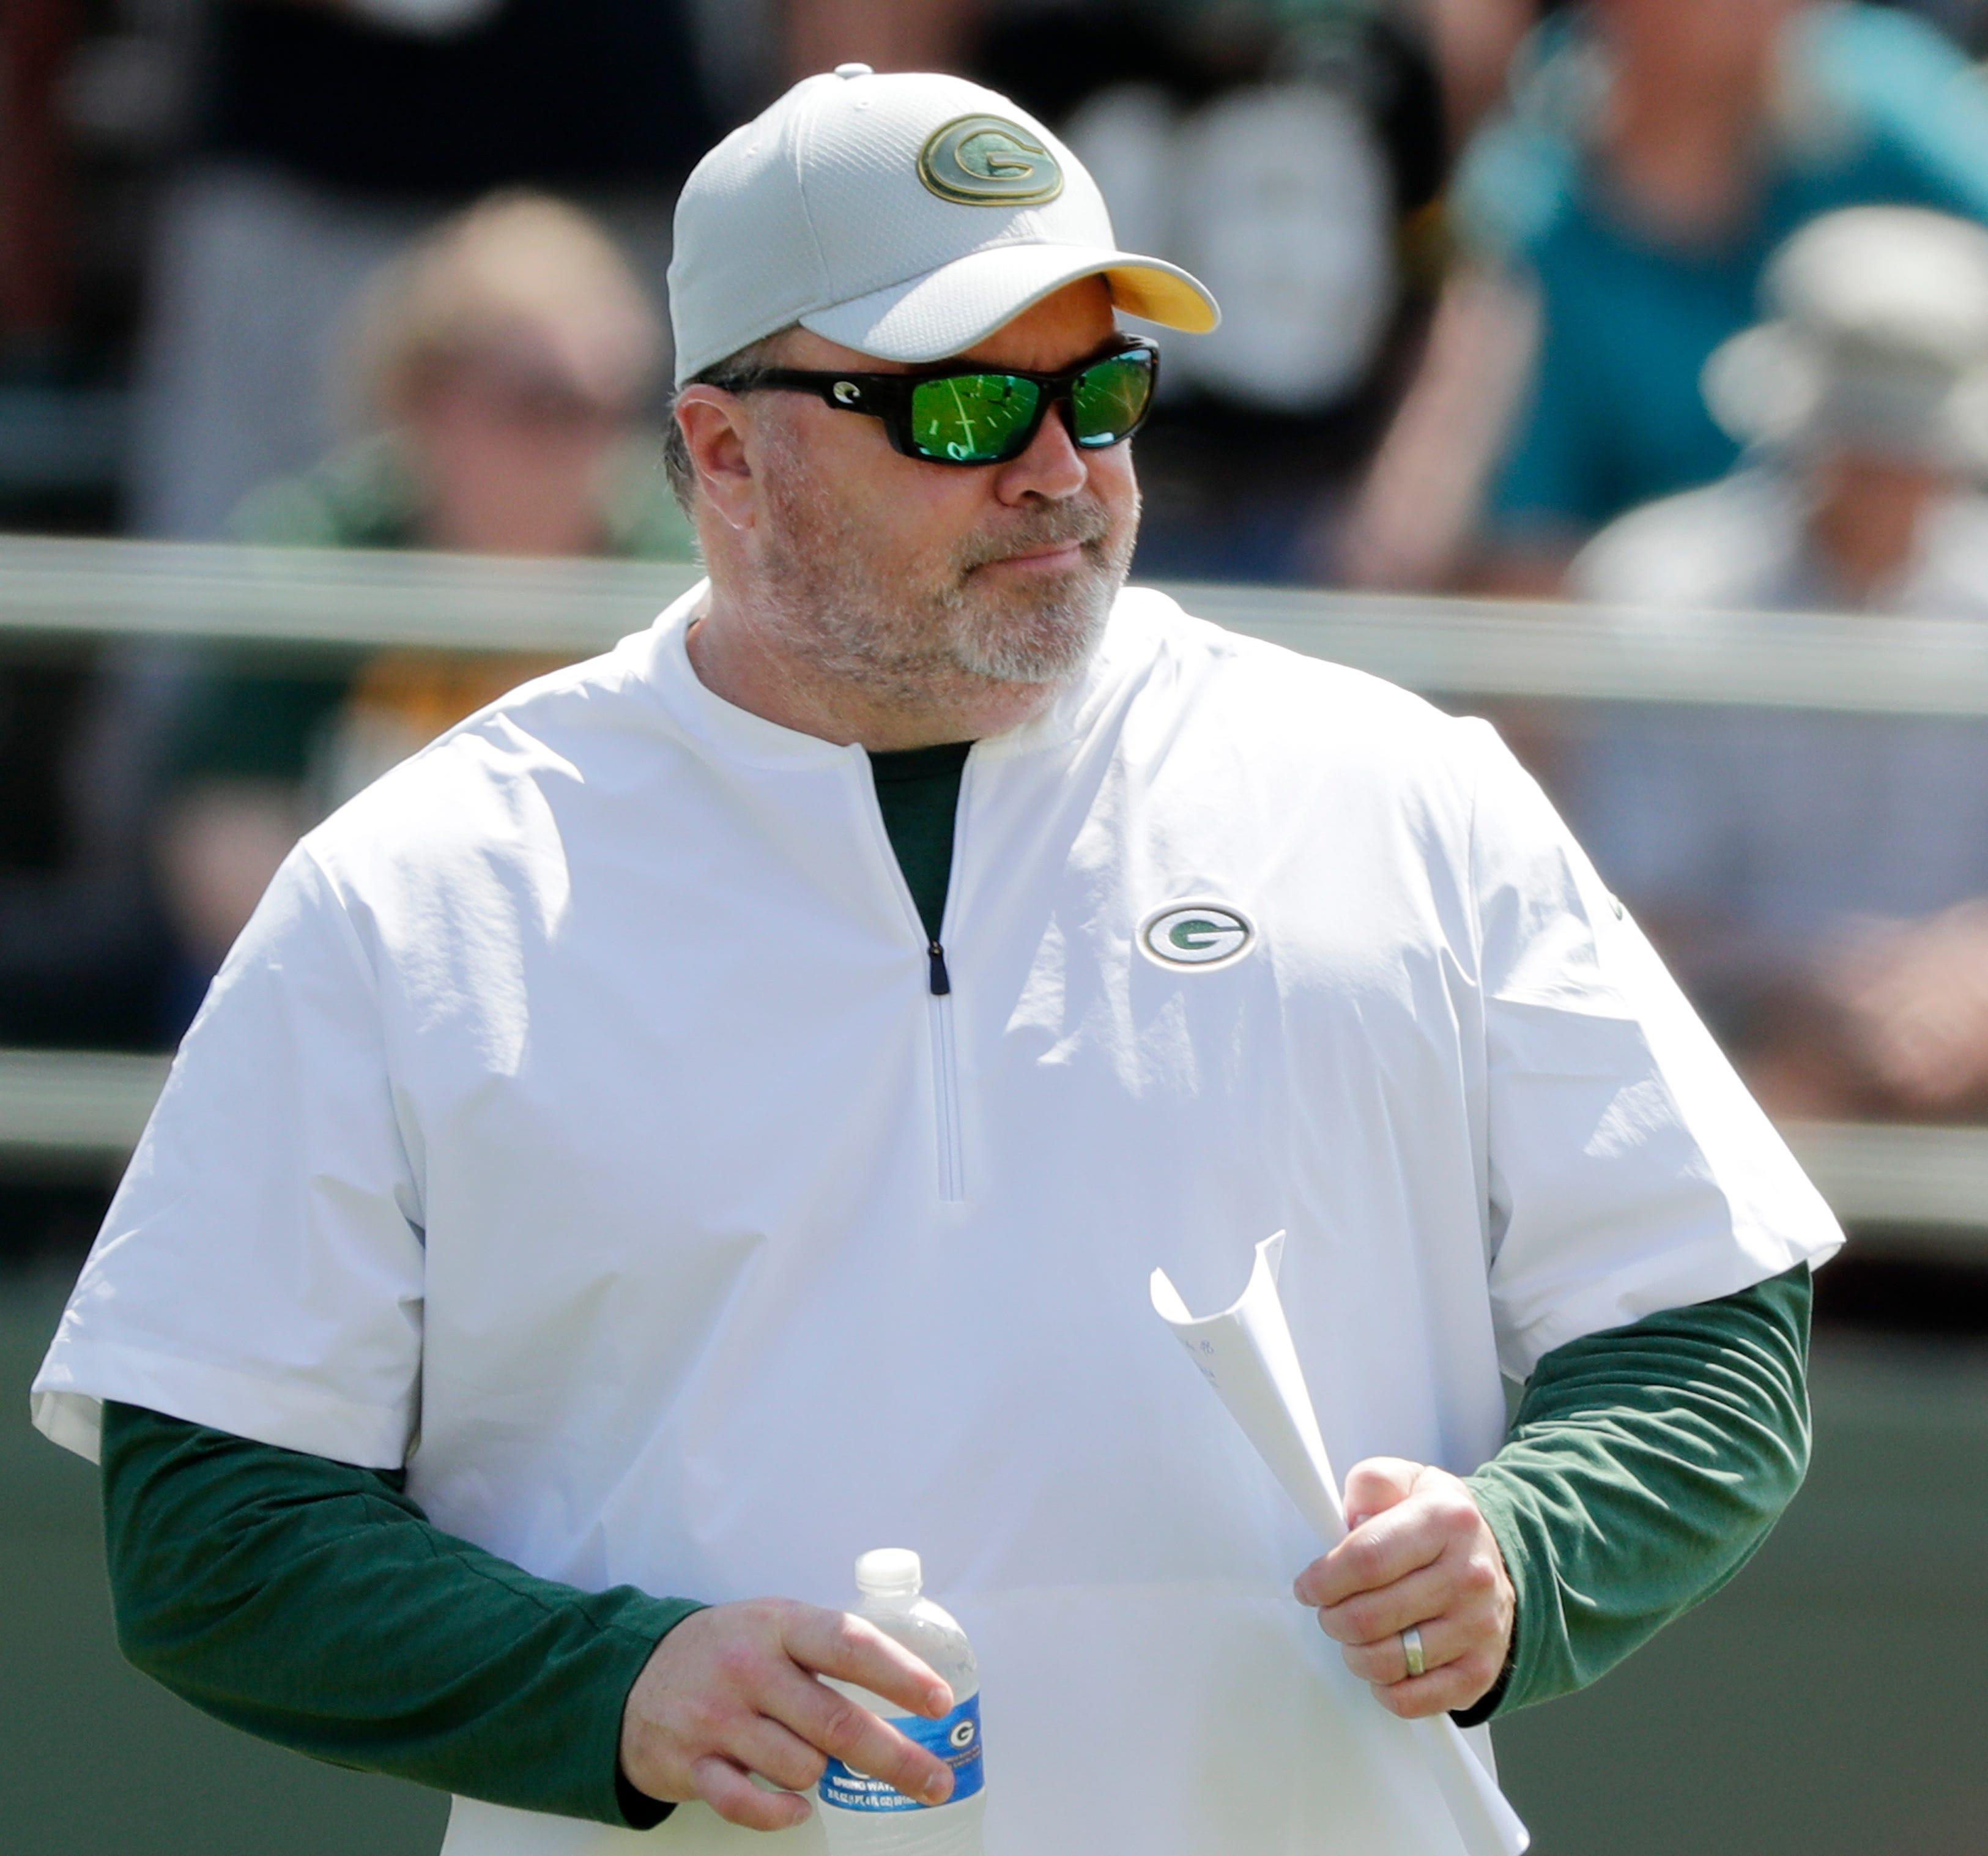 Mike McCarthy denies 'unbelievable' report of missing team meetings for massage